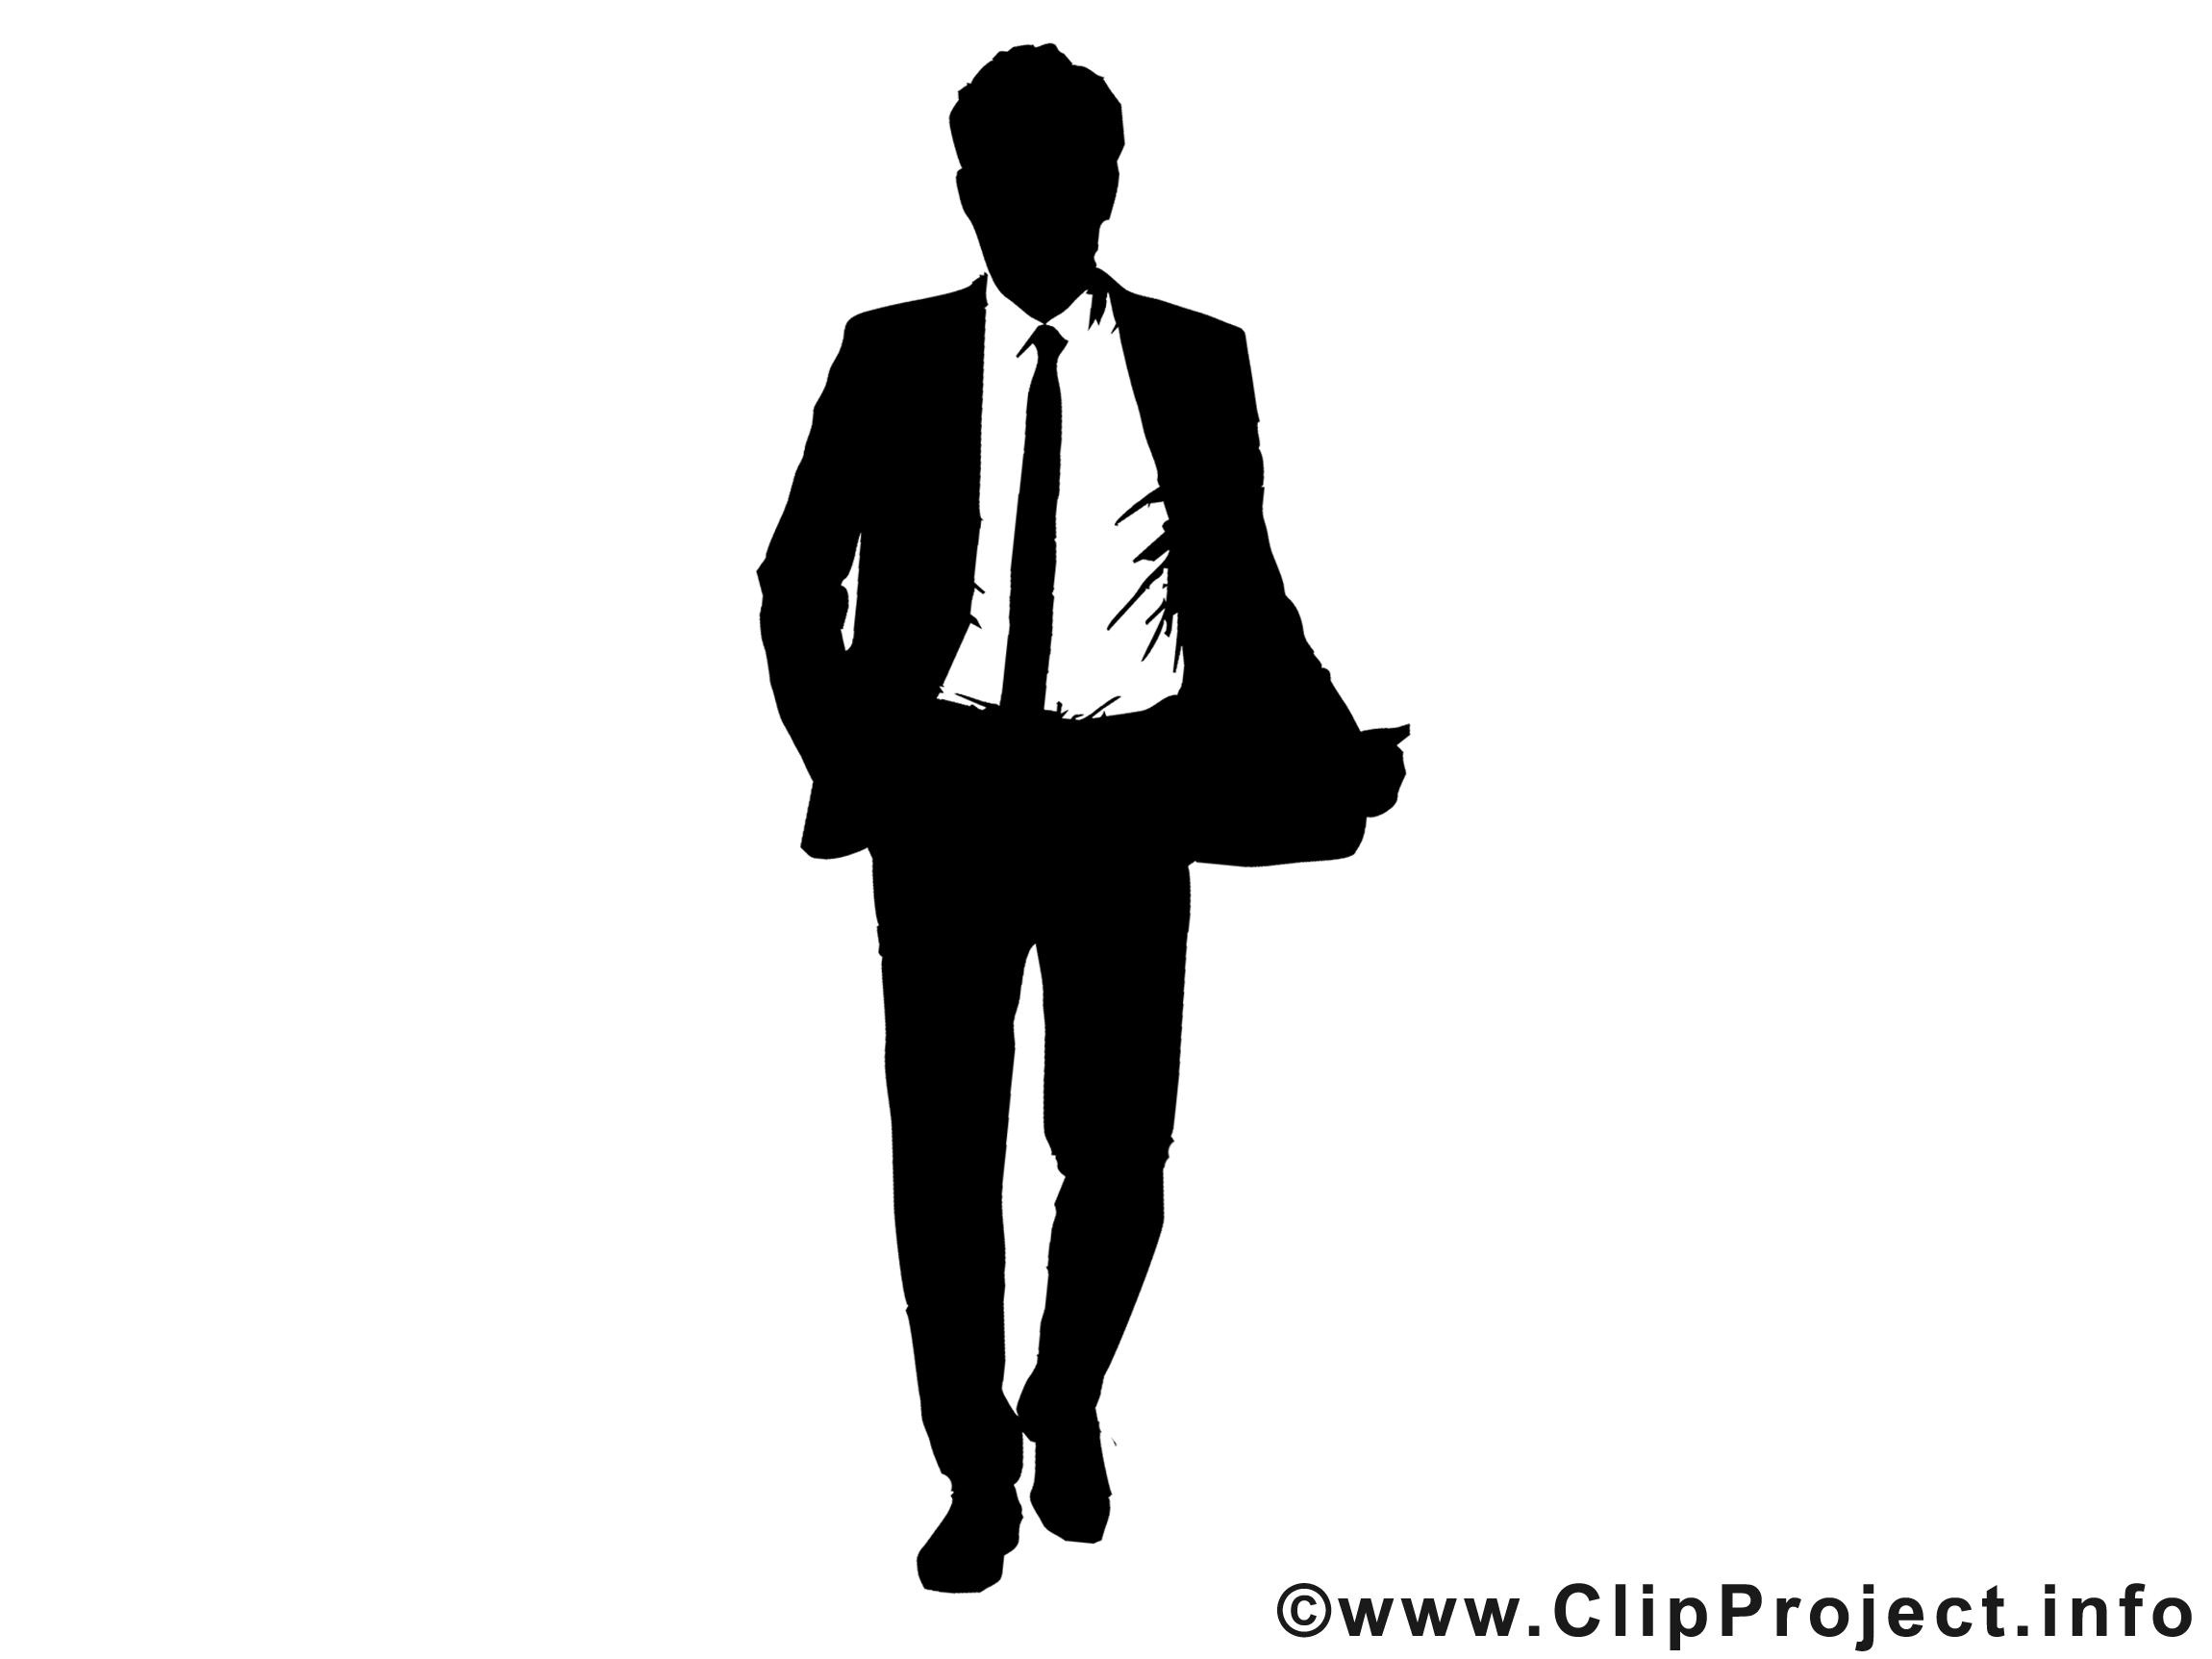 Bild mann clipart svg transparent download Im Clipart - Clipart Kid svg transparent download